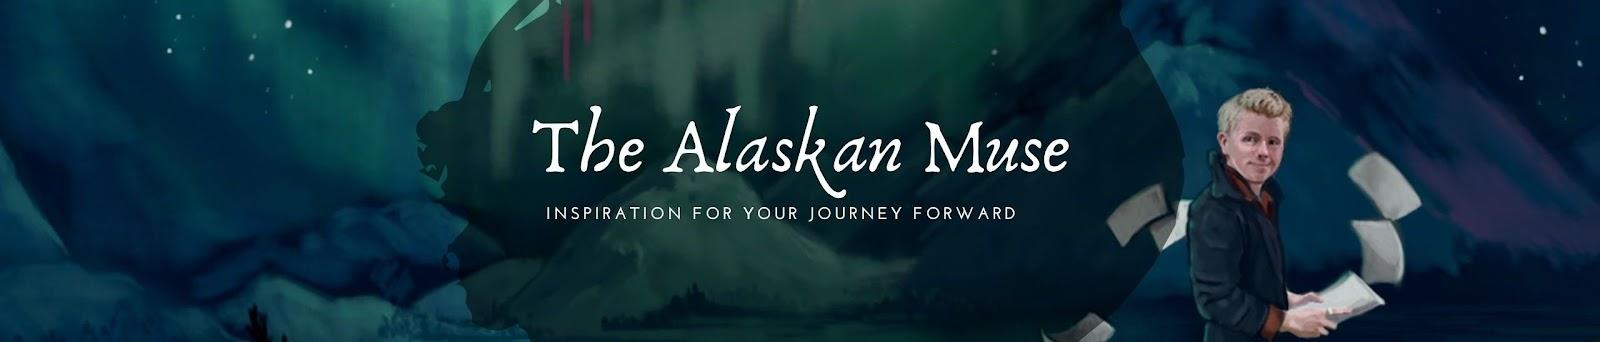 The Alaskan Muse